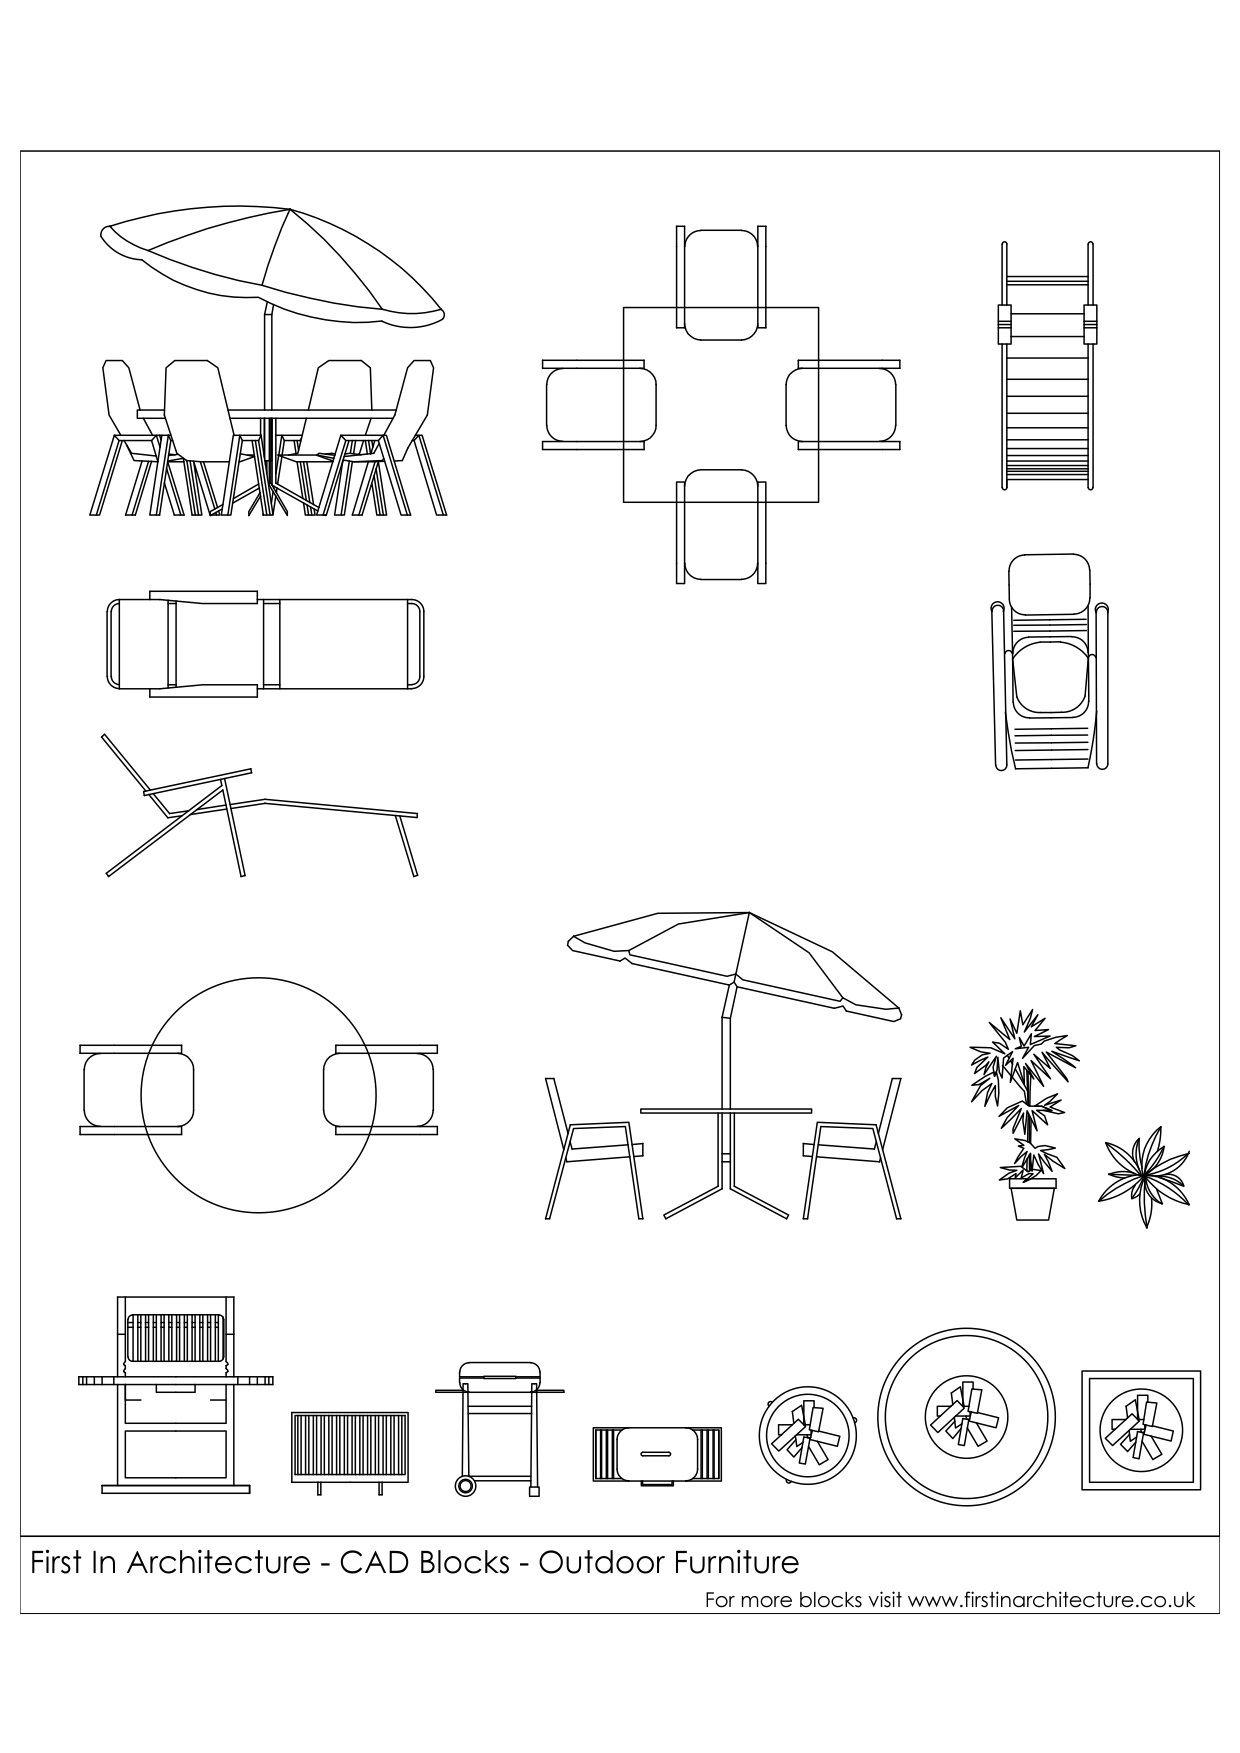 cad symbole k che cad symbole v4. Black Bedroom Furniture Sets. Home Design Ideas